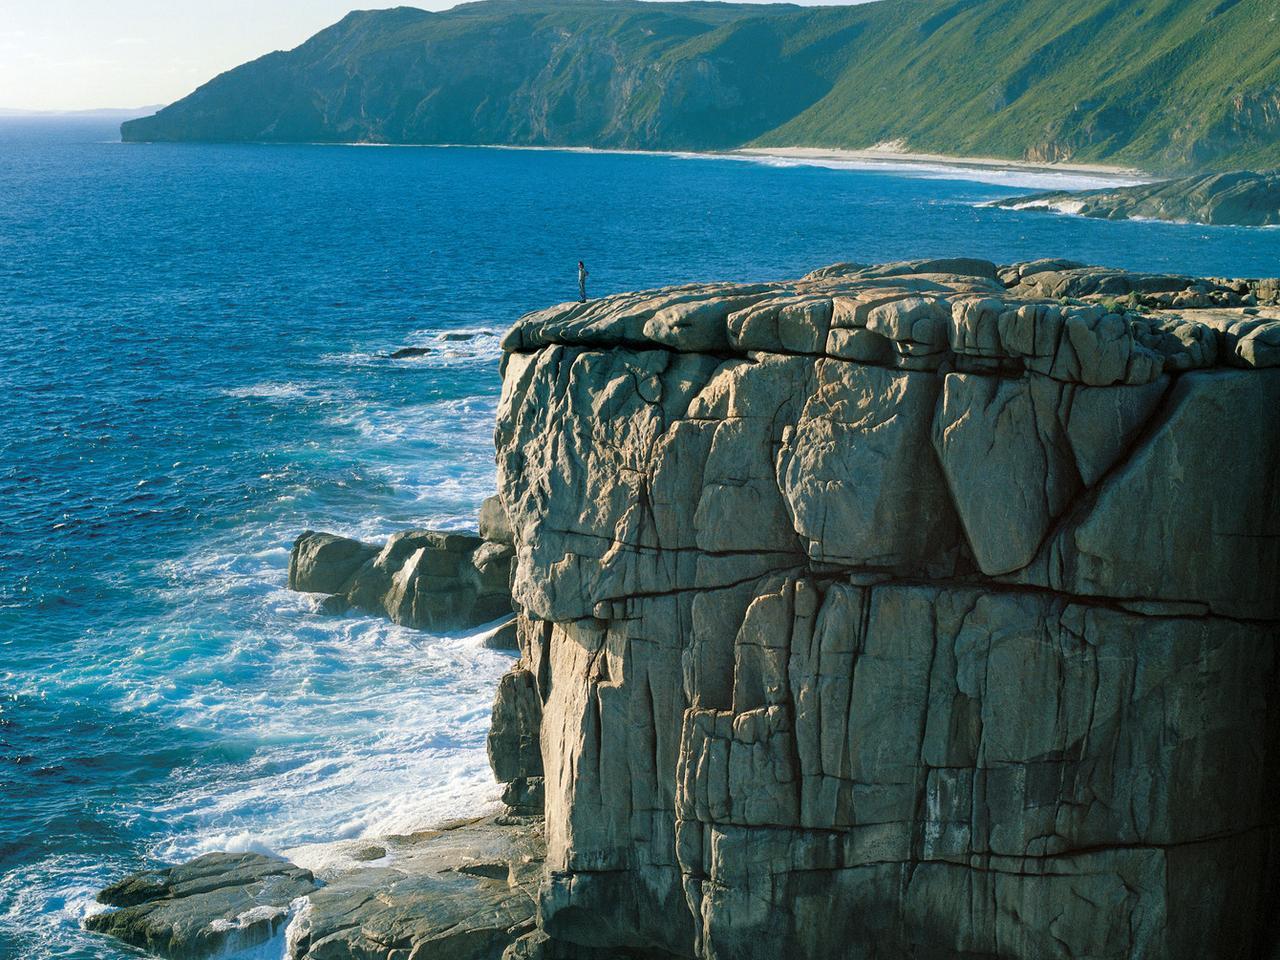 The Gap near Albany in Western Australia. For Escape travel. Supplied. Please credit Tourism Western Australia.